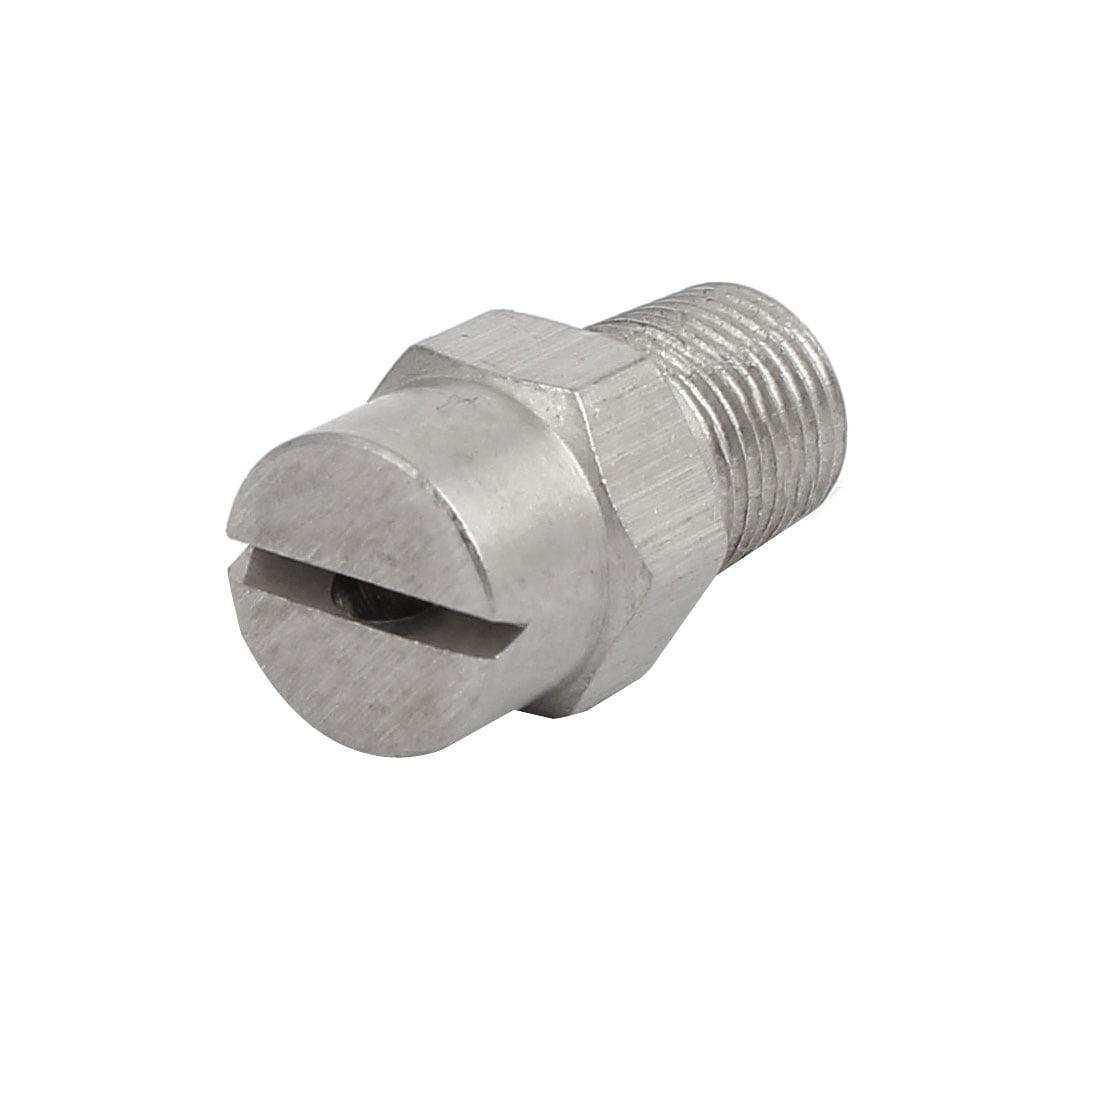 1/8BSP 2.4mm Orifice Spray Dia 95 Degree Stainless Steel Flat Fan Spray Tip - image 3 of 3